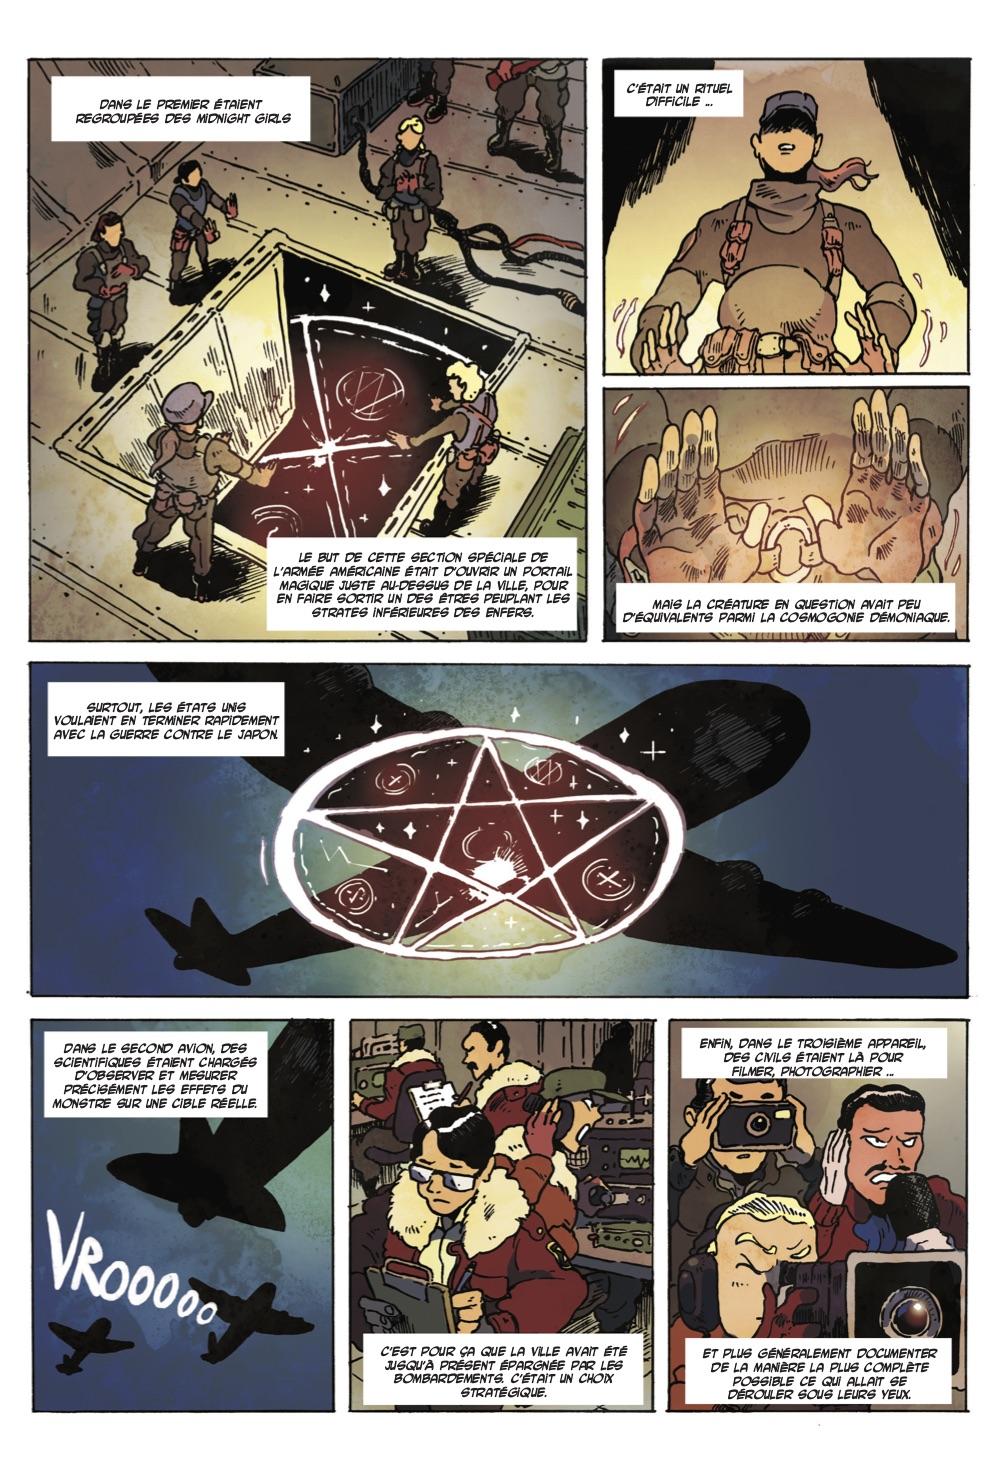 midnight tales #3_planche 2